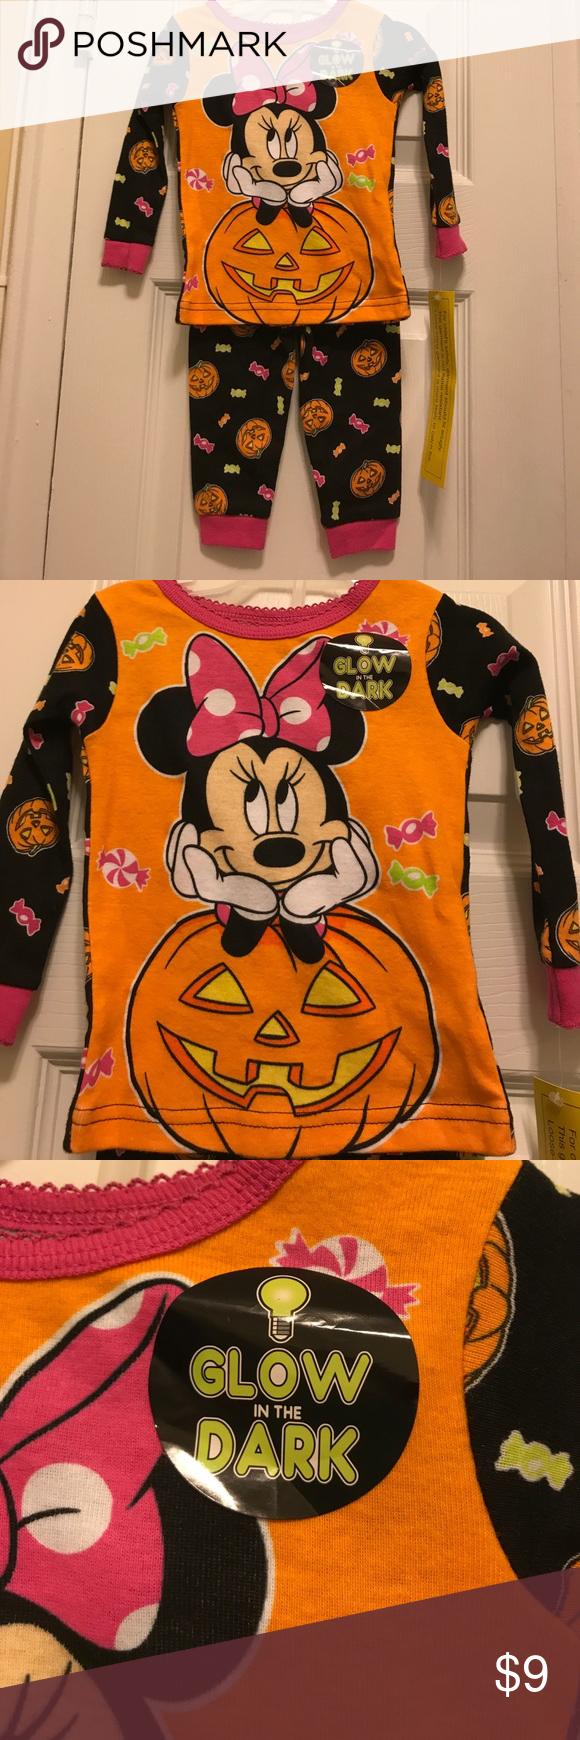 nwt disney baby halloween pjs minnie mouse 9 month brand new with tag disney baby halloween